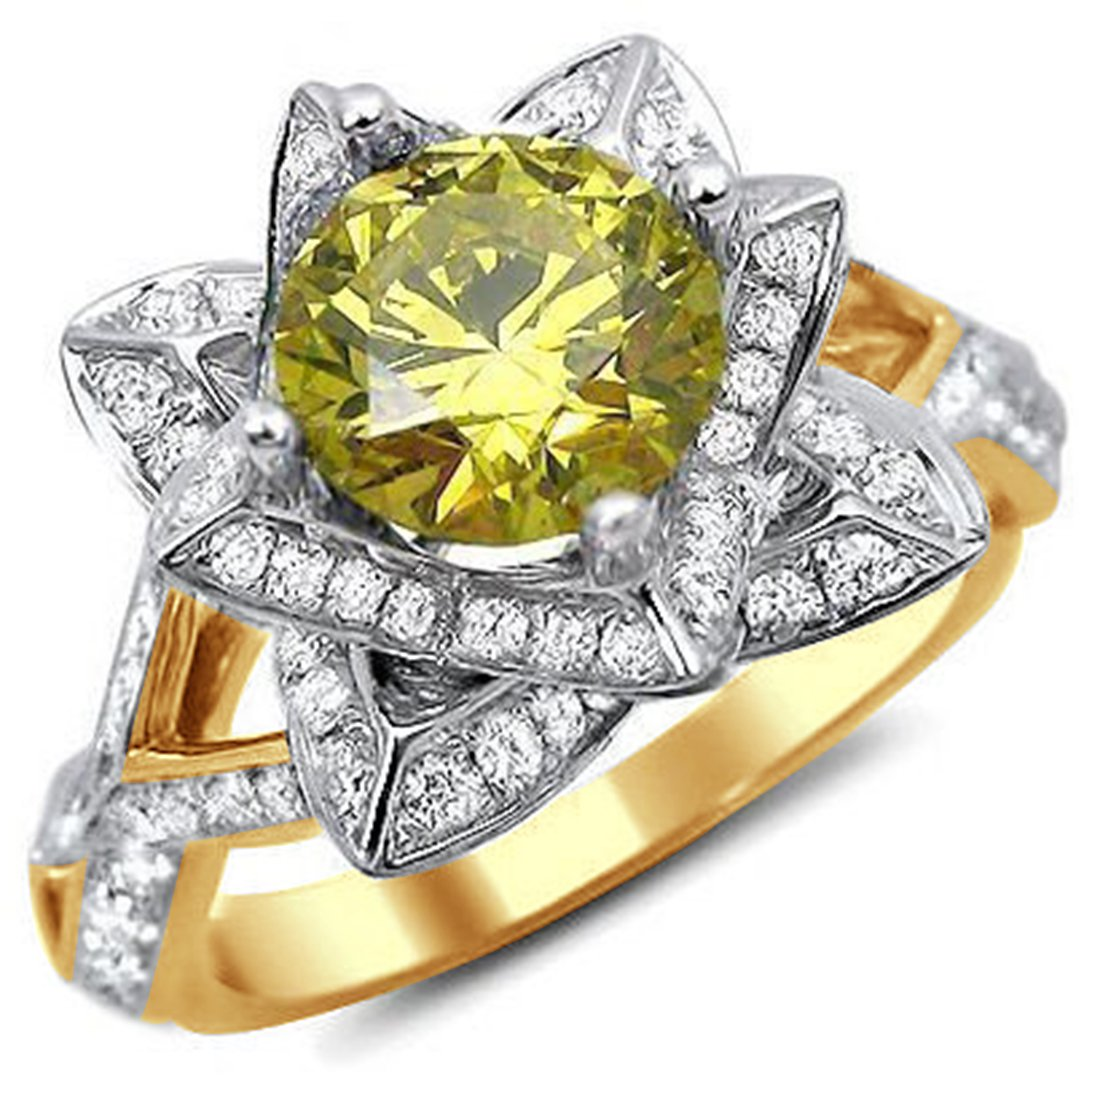 Smjewels 2.00 Ct Yellow Round Sim.Diamond Lotus Flower Engagement Ring 14K Yellow Gold Plated